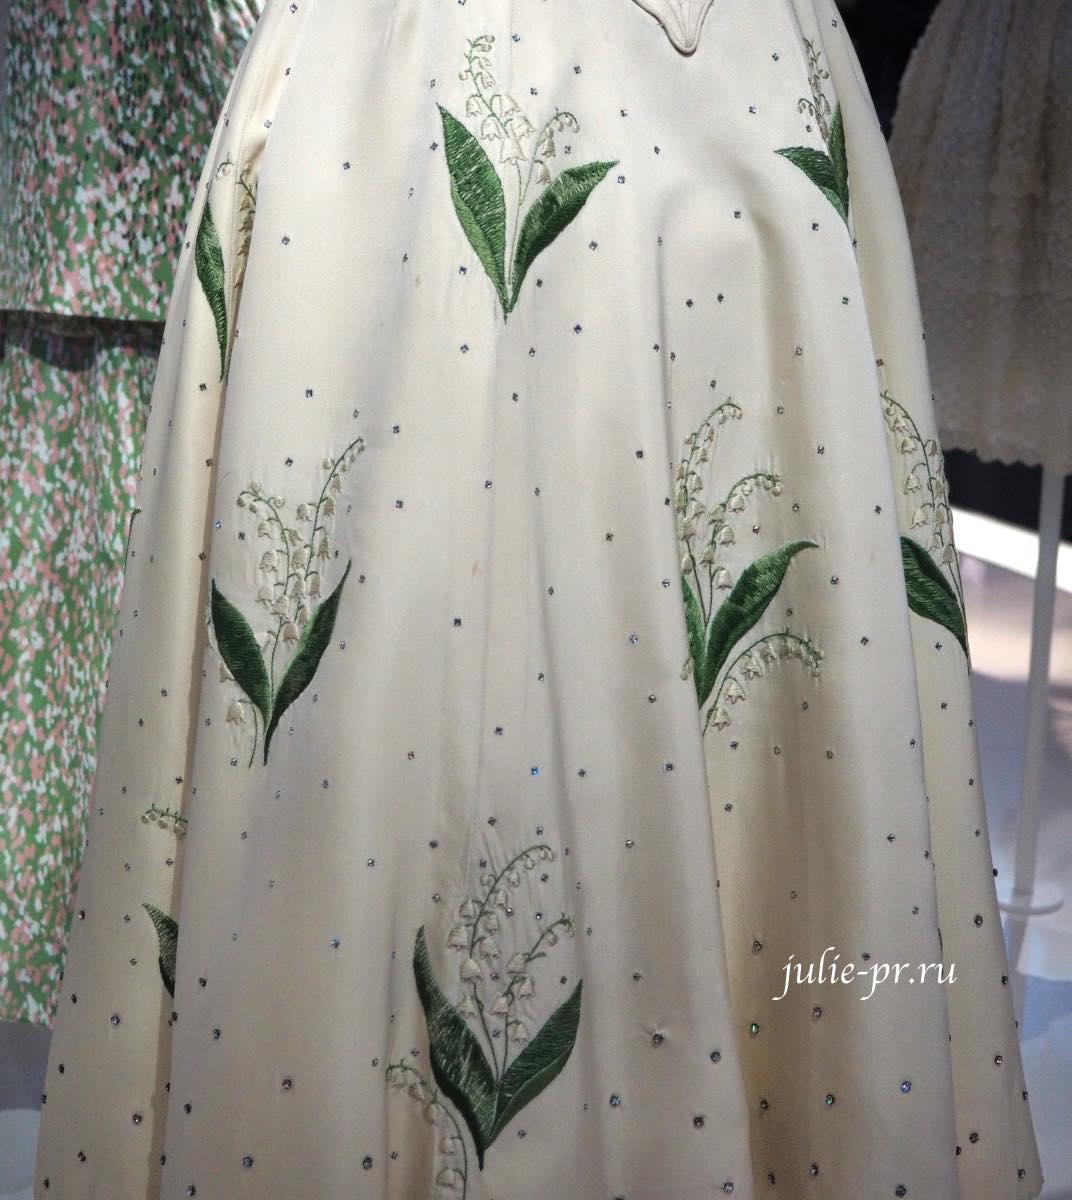 Платье с ландышами (Christian Dior Haute couture 1956). Вышивка